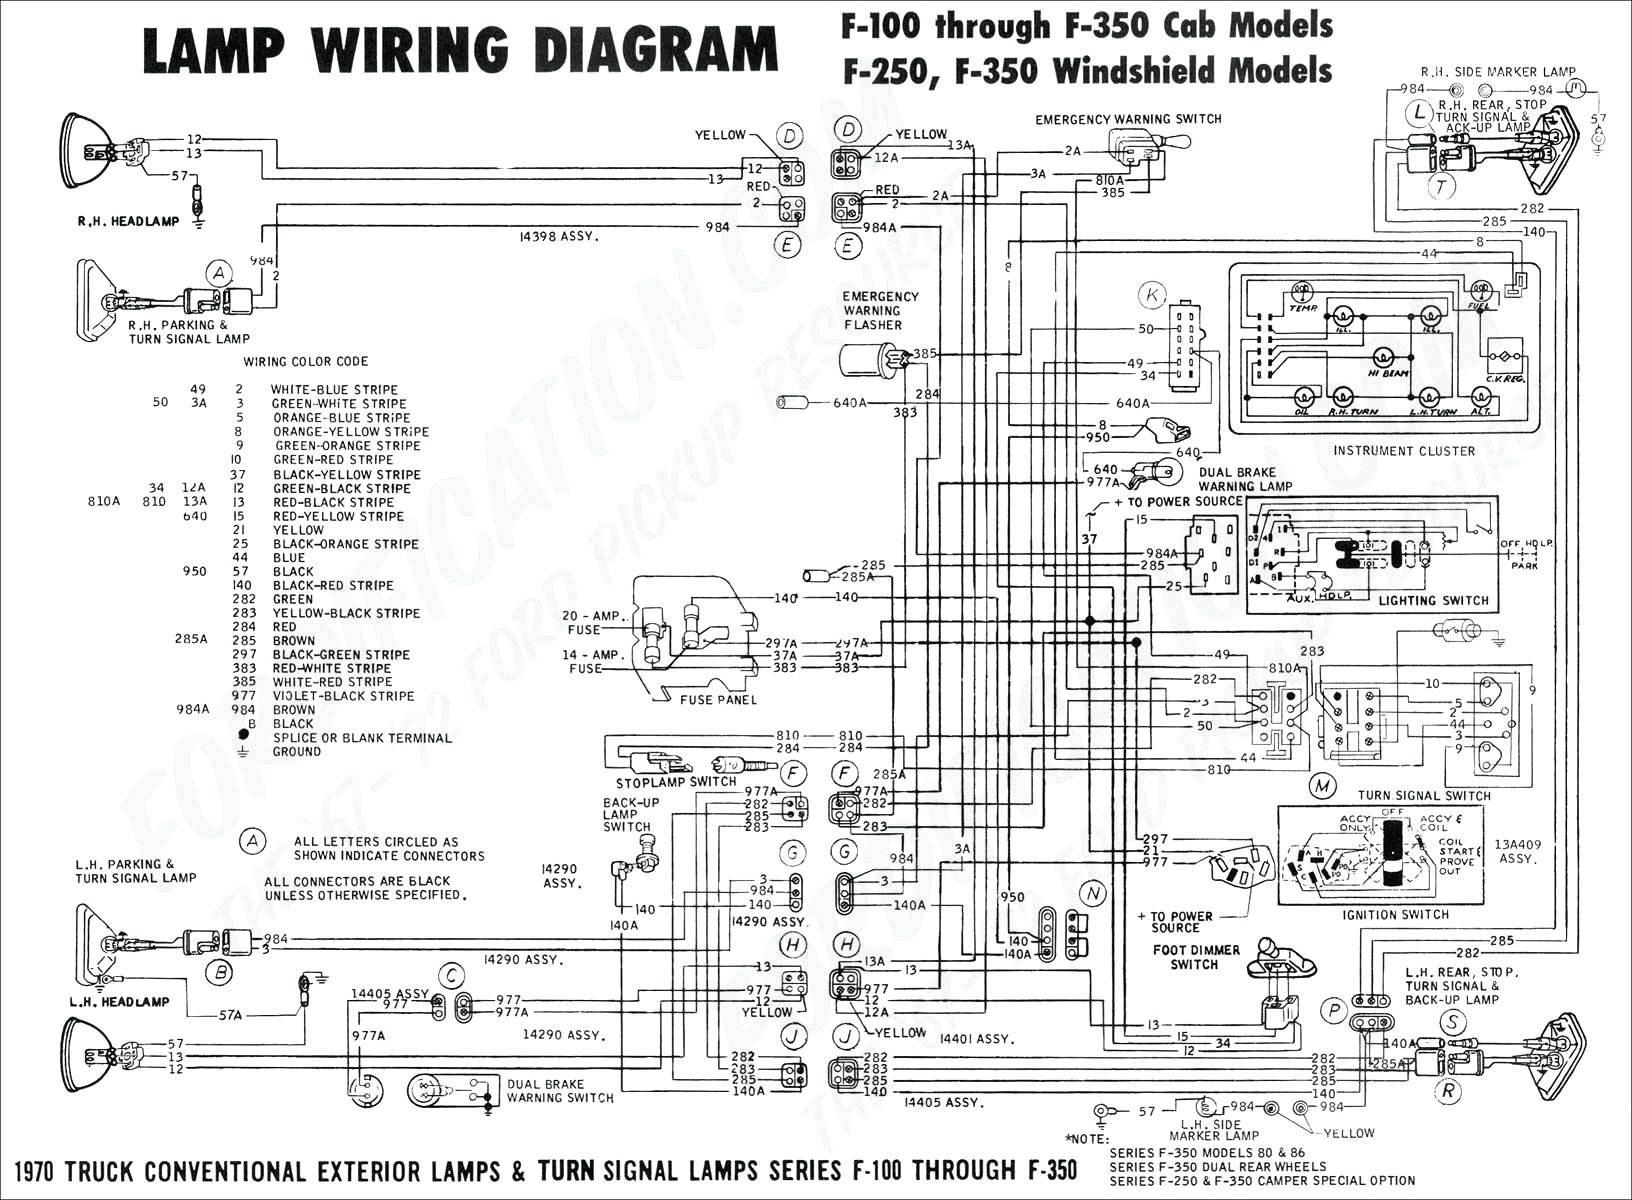 Bose Car Amplifier Wiring Diagram 04 Trailblazer Radio Wiring Diagram Of Bose Car Amplifier Wiring Diagram